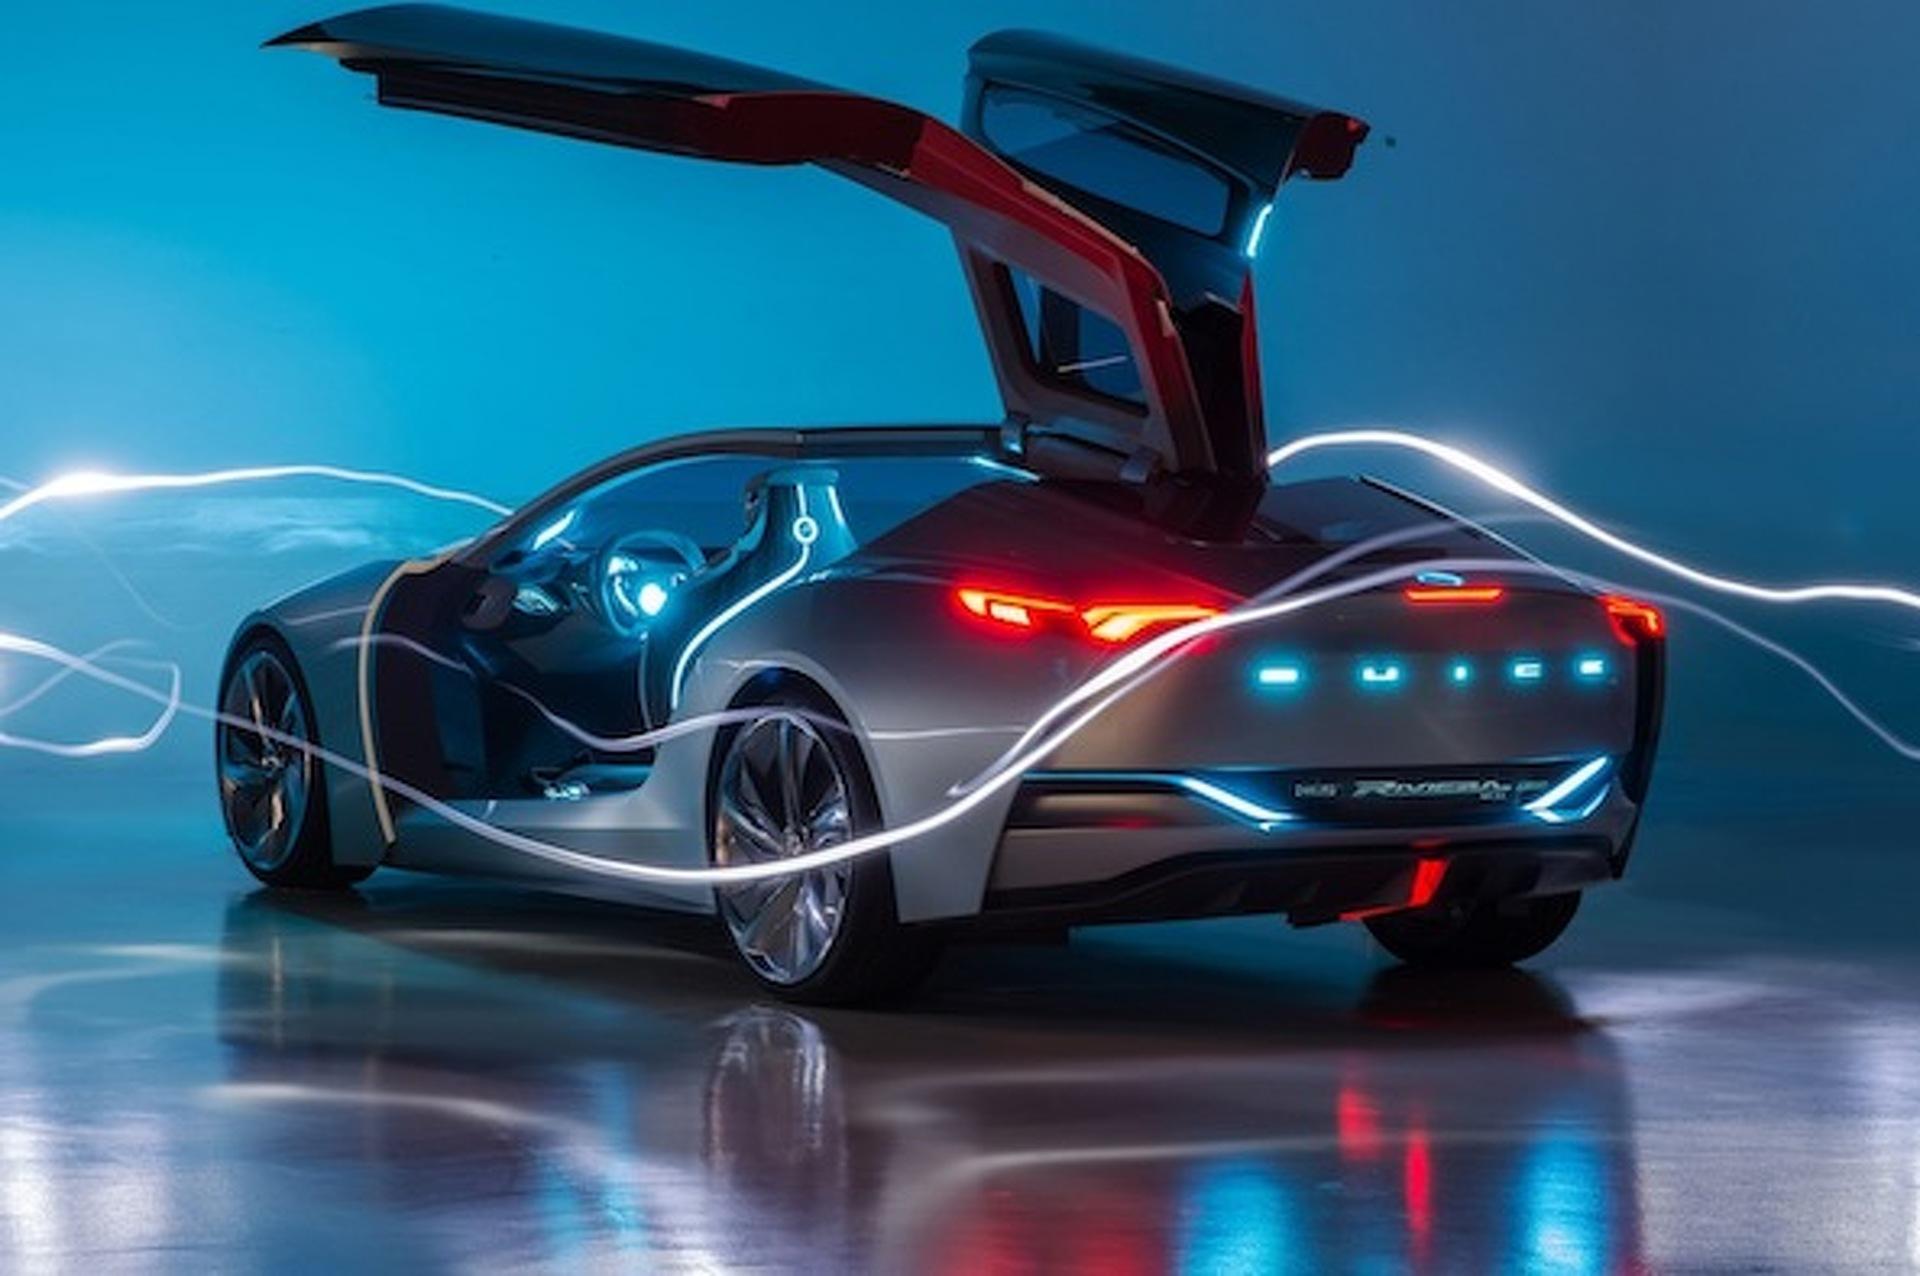 Wheels Wallpaper: 2013 Buick Riviera Concept